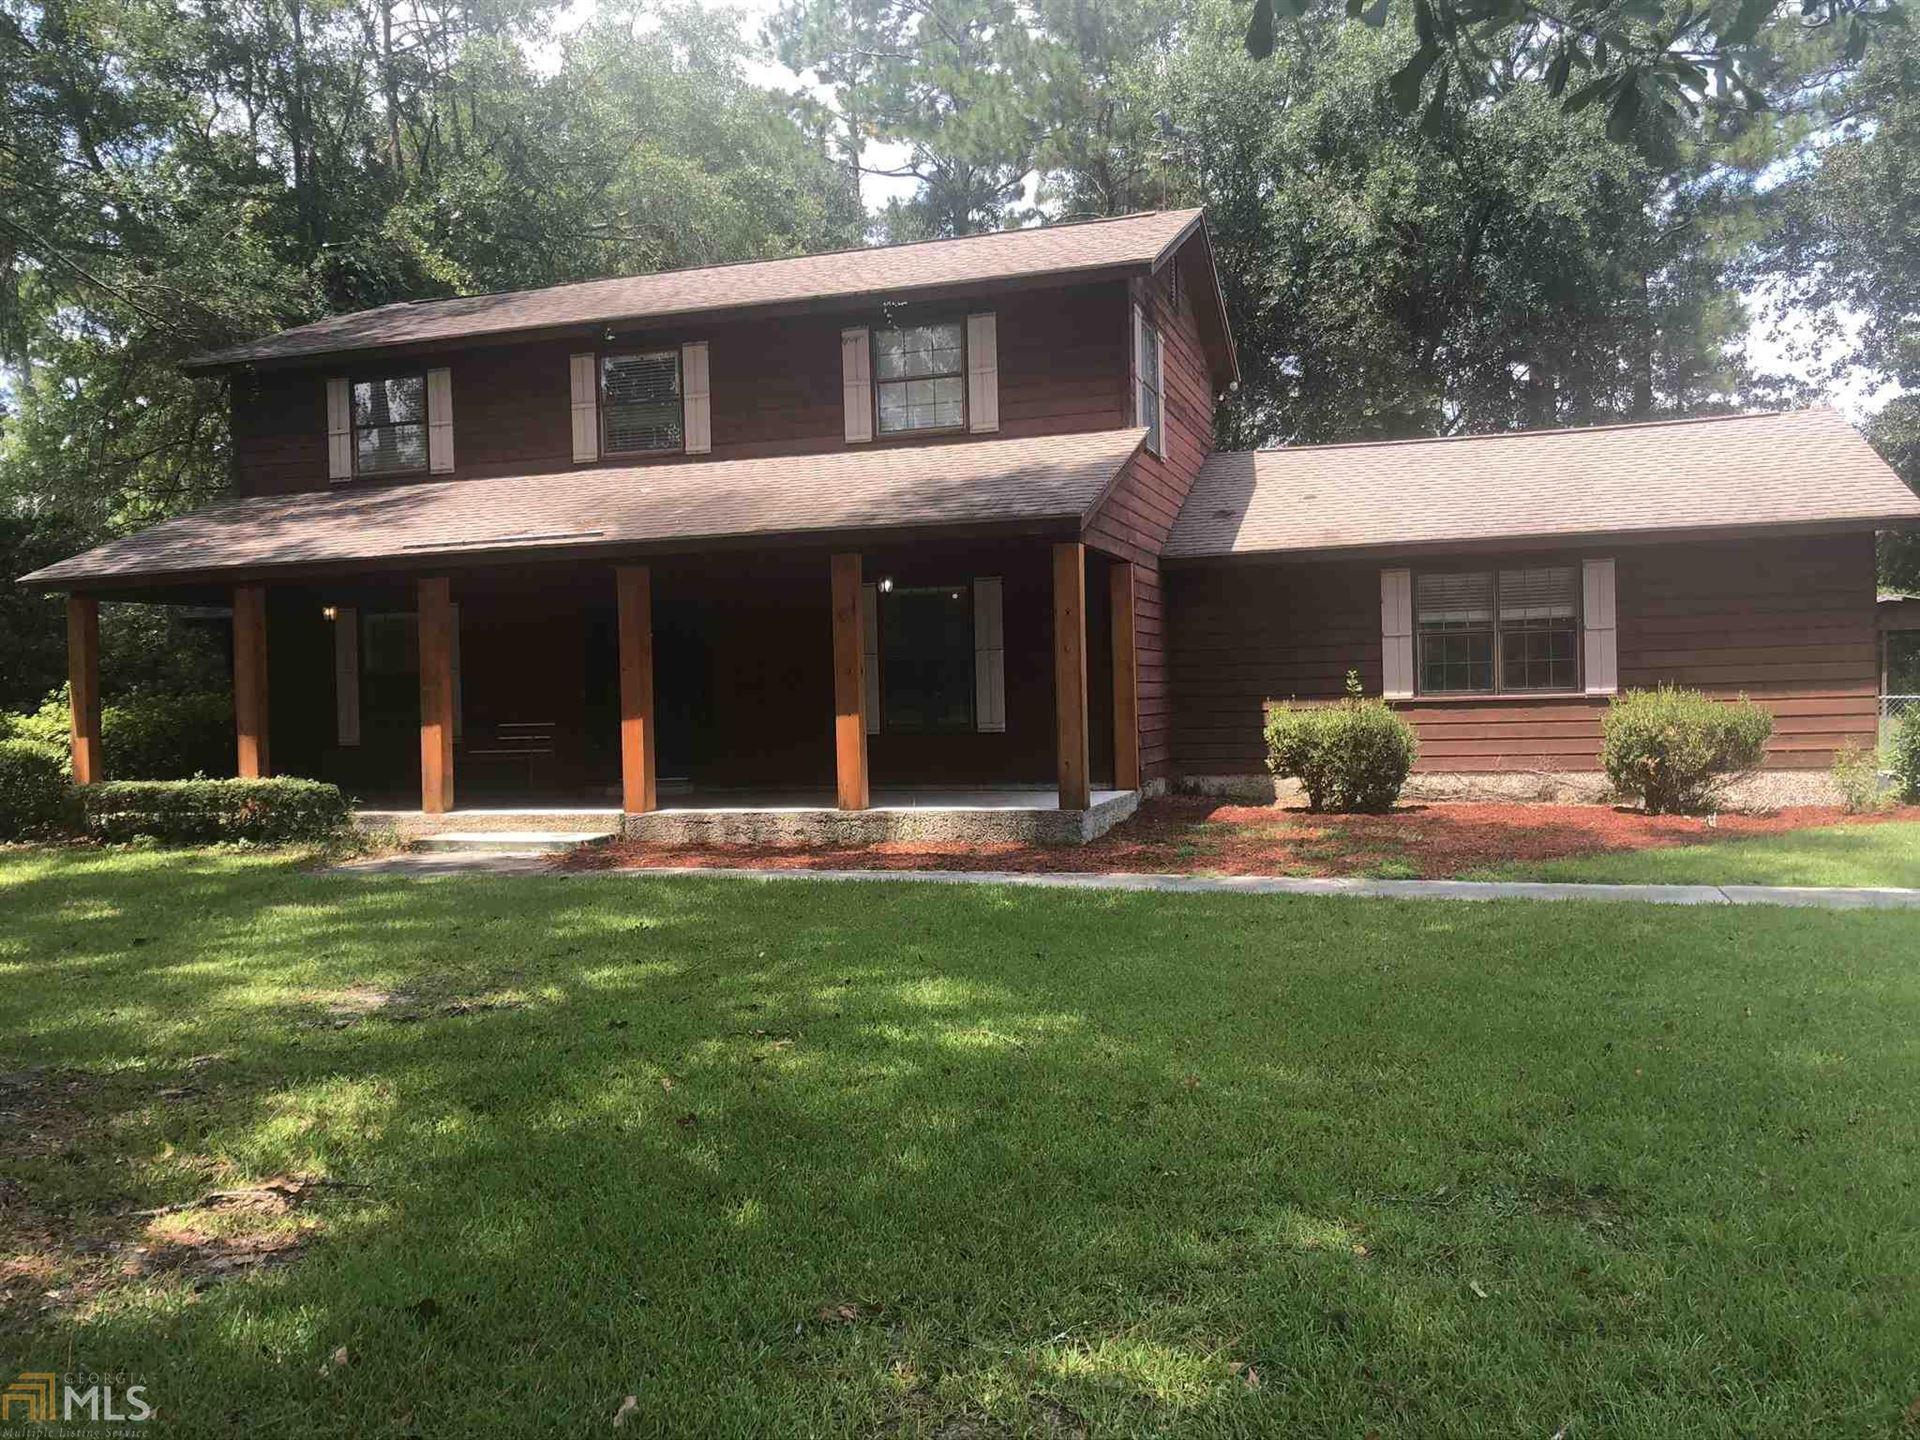 111 Holly Dr, Statesboro, GA 30458 - #: 8838784